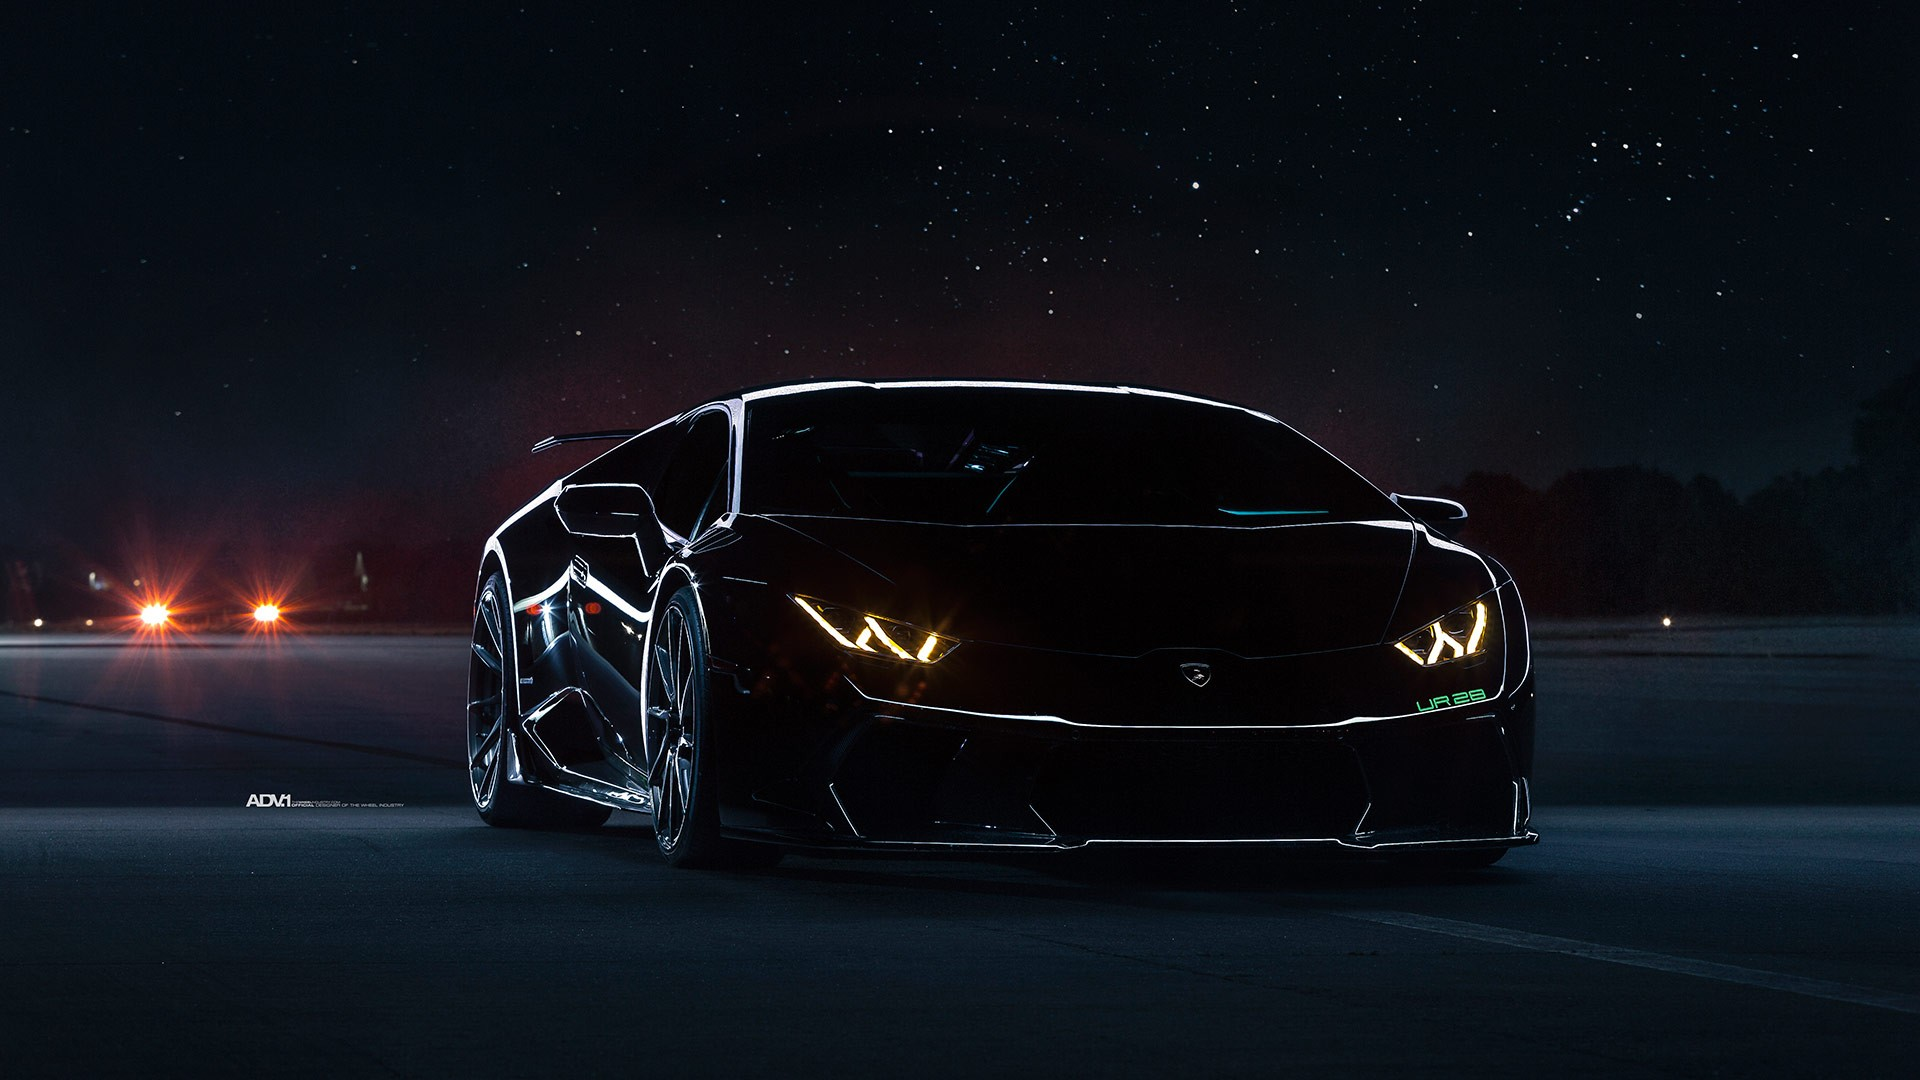 Tuning Car Iphone Wallpaper Lamborghini Huracan Black Underground Racing Twin Turbo